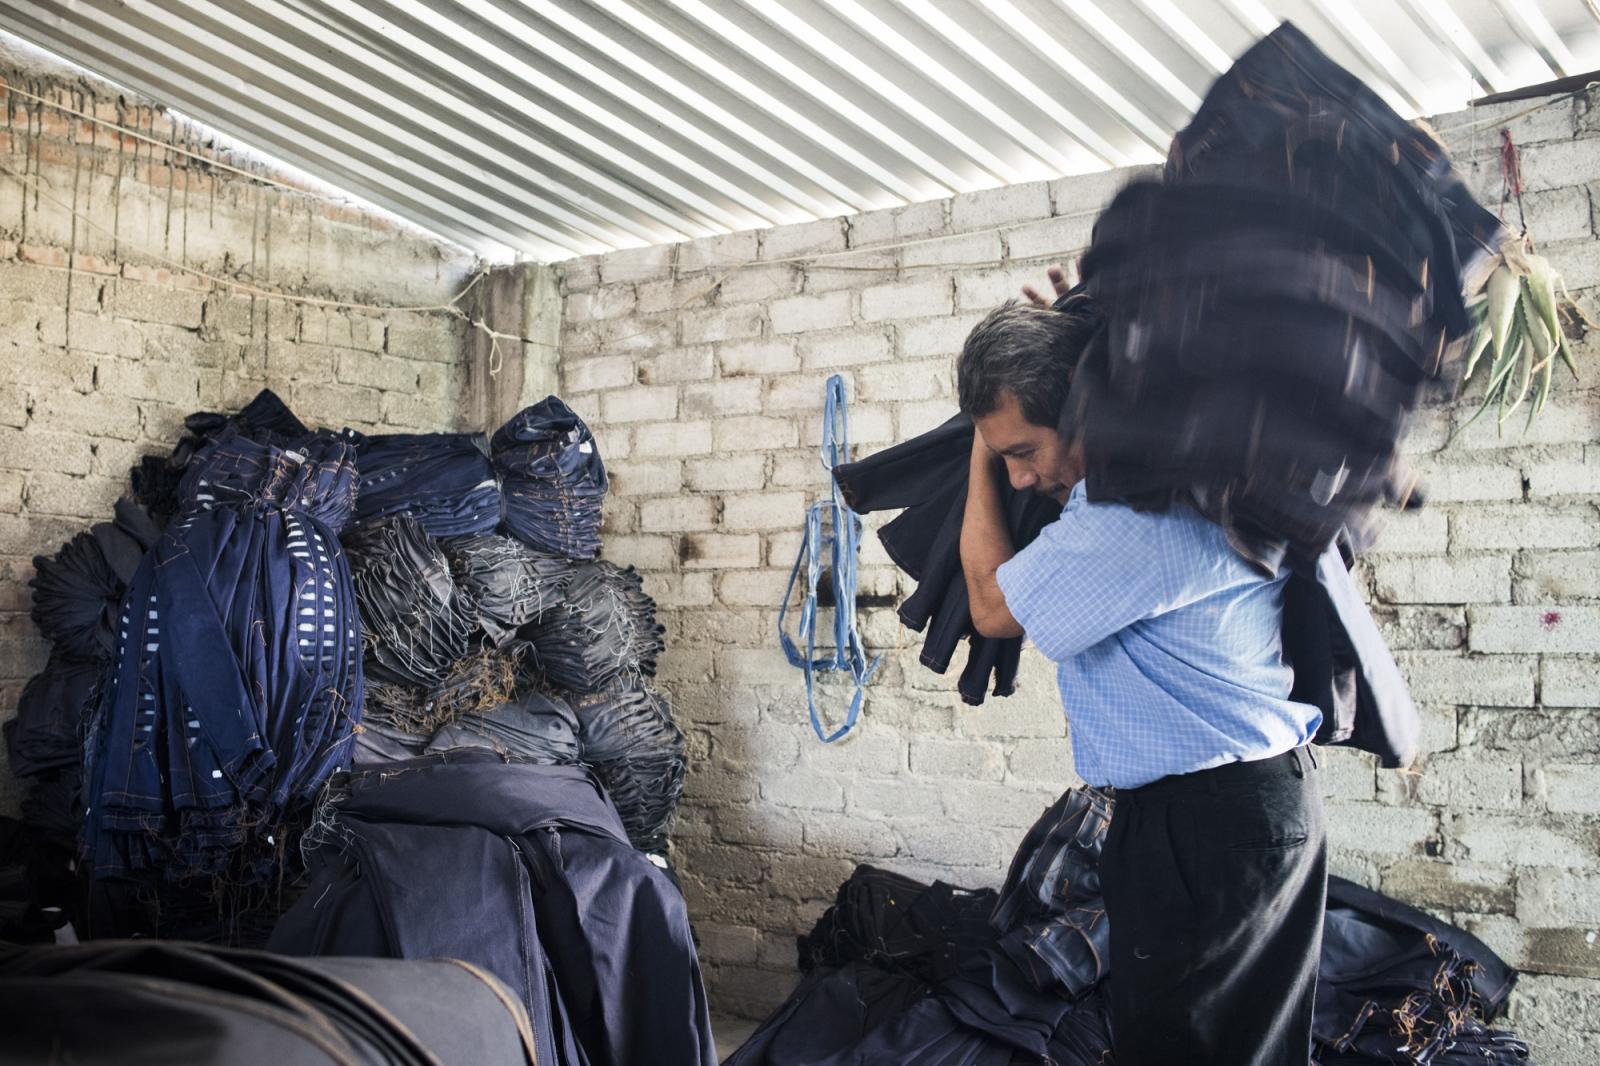 Clandestine denim enterprise in Tehuacan